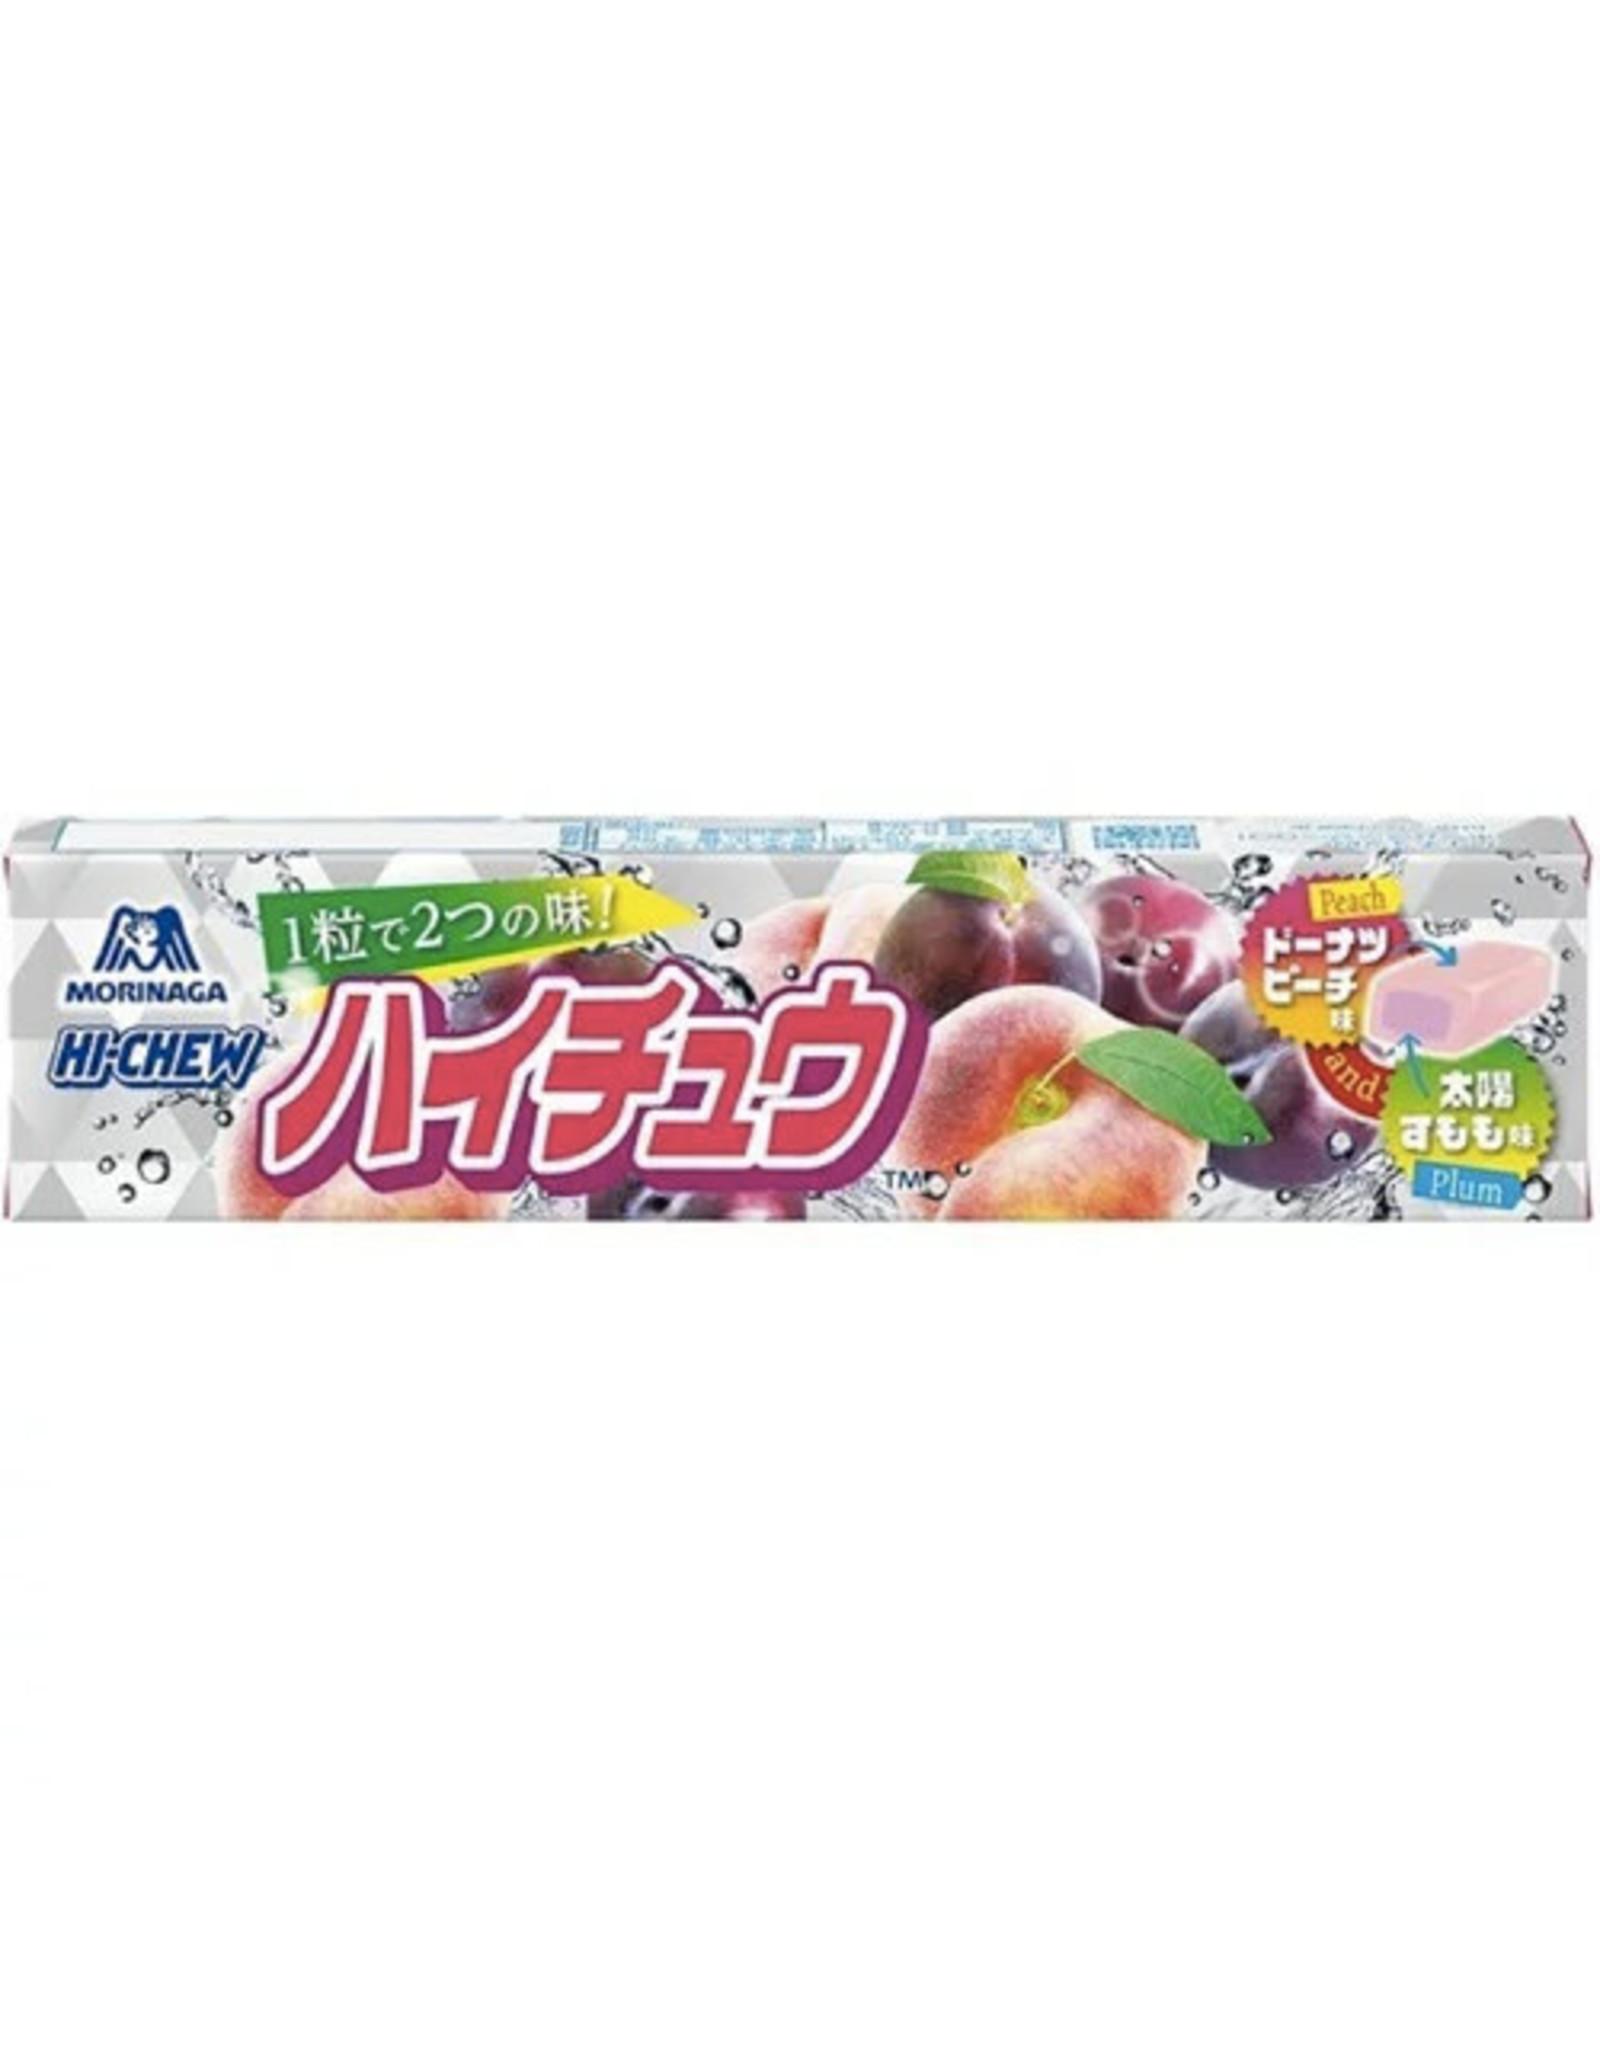 Hi-Chew Plum & Peach